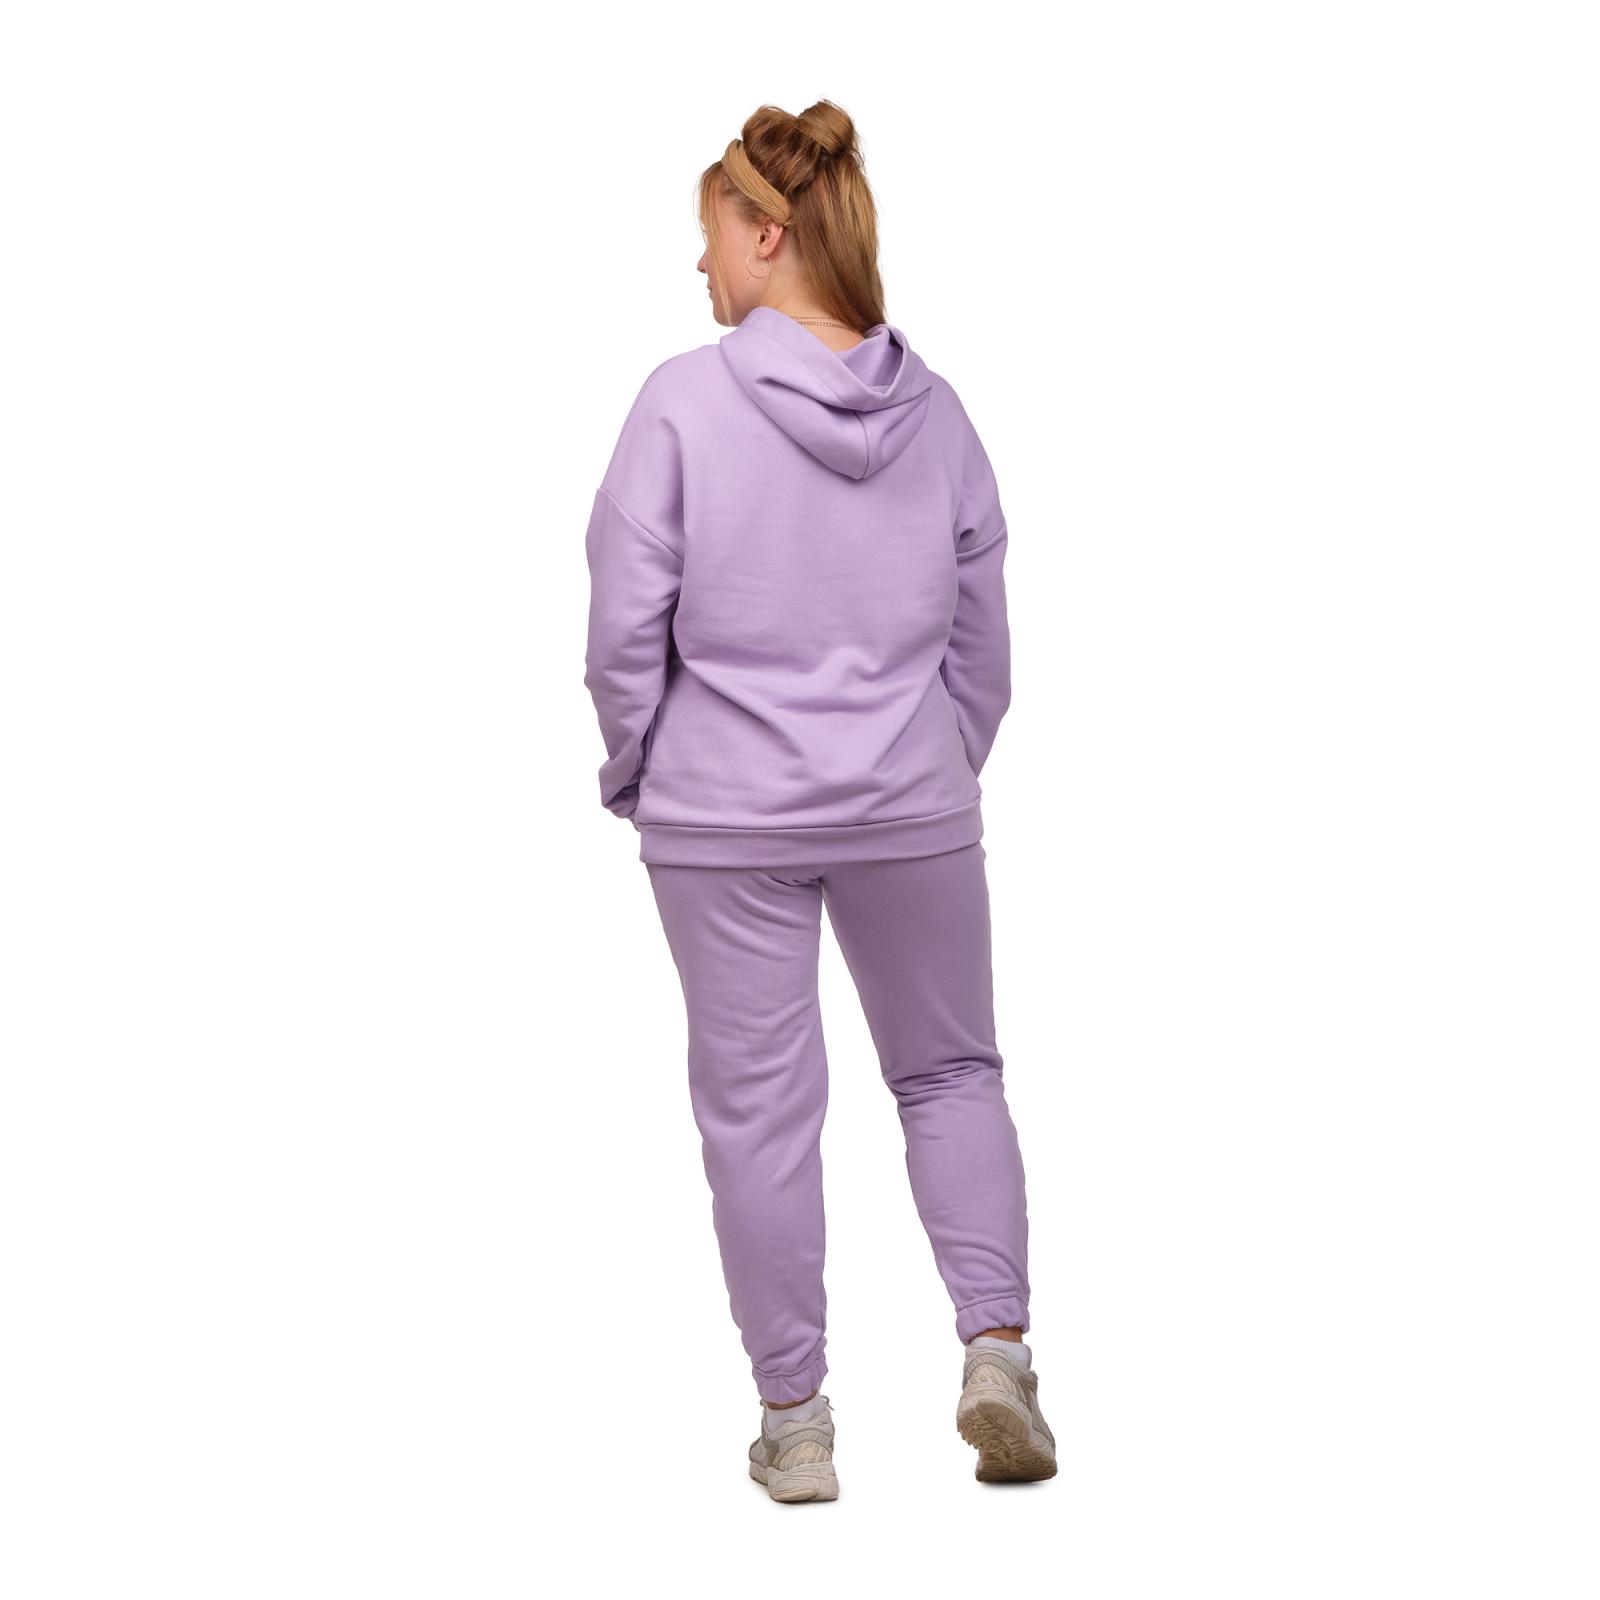 Костюм футер-петля Лиловый (худи+брюки) М-0186Л